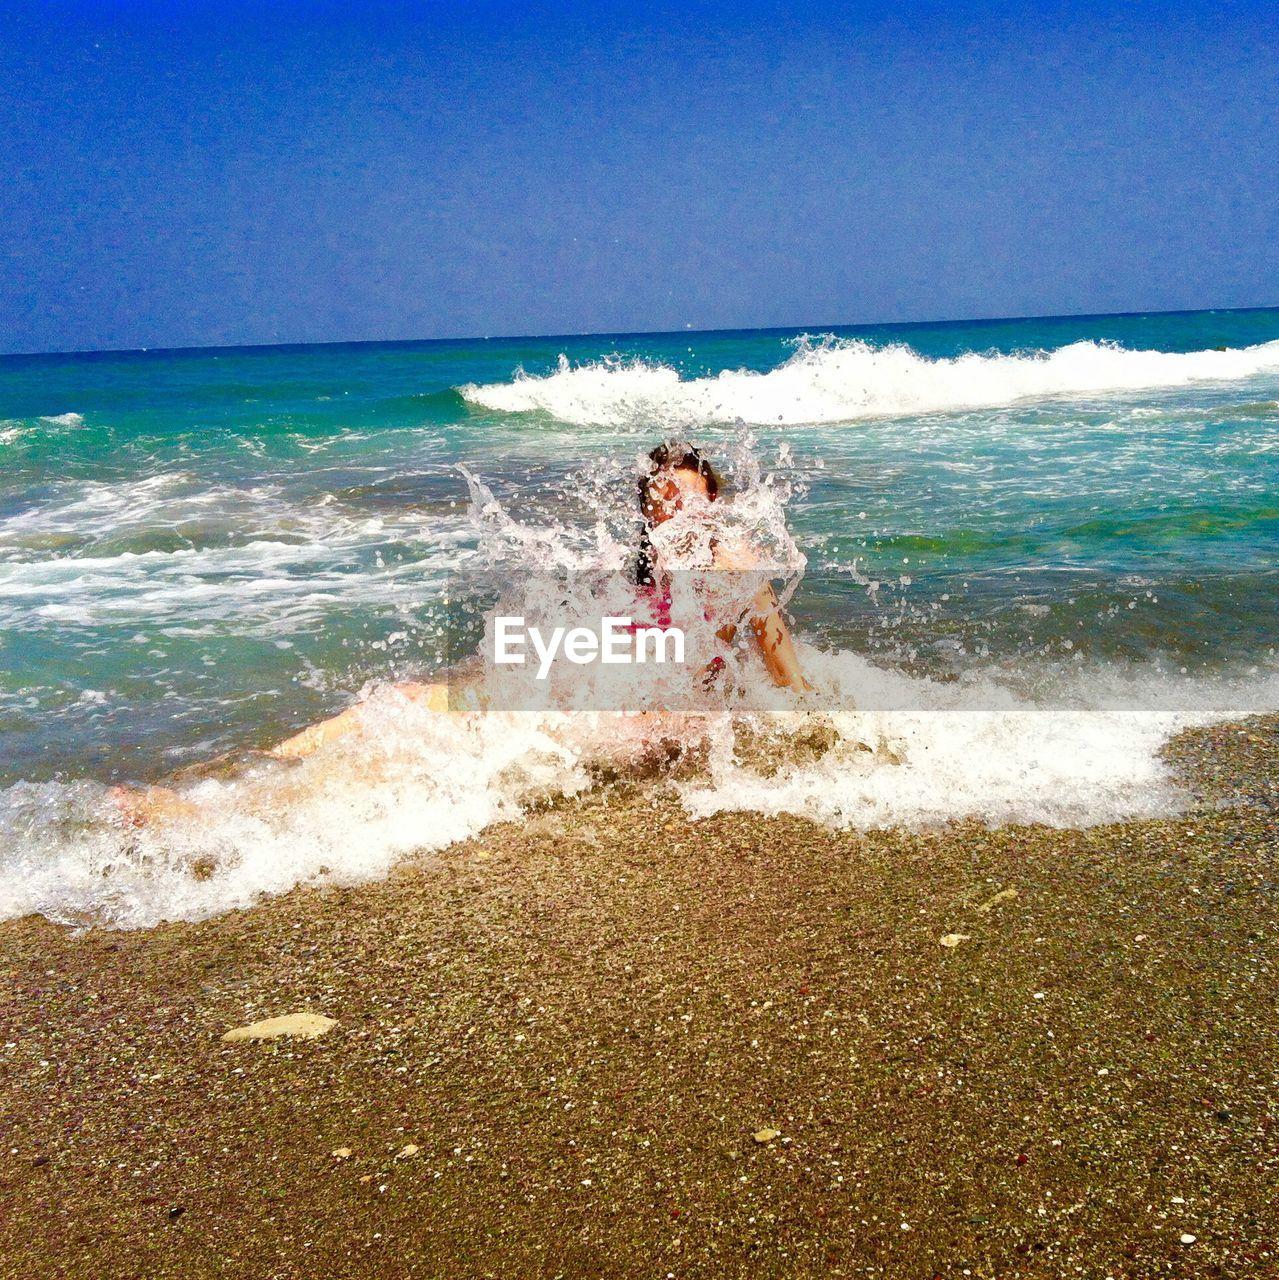 Woman Sitting On Splashing Sea Waves At Beach Against Sky